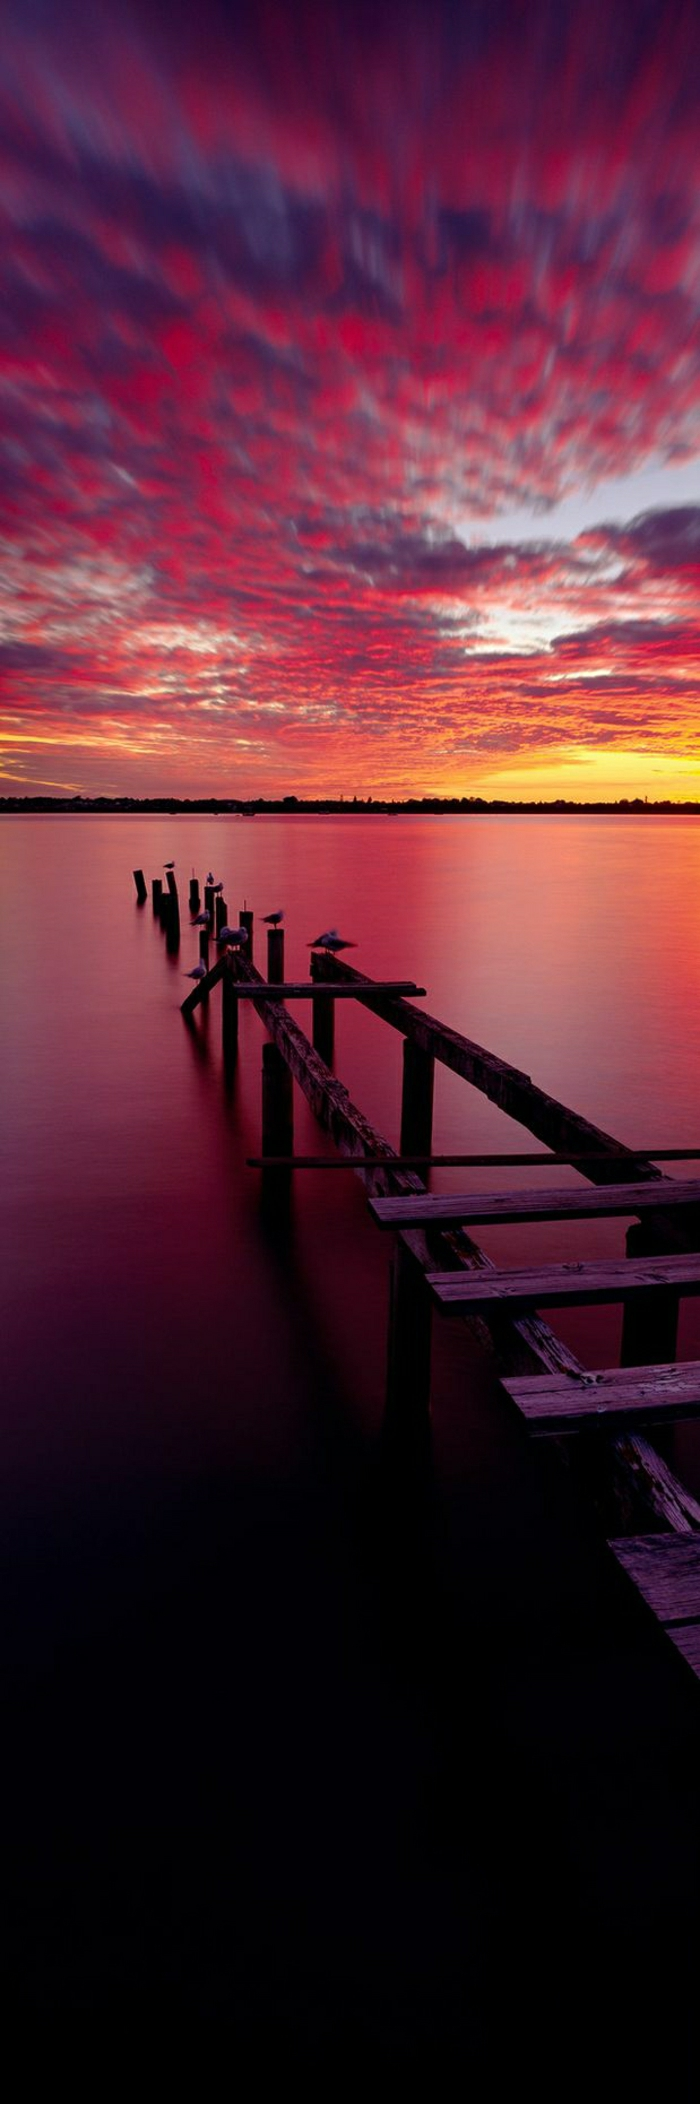 schöner-Sonnenuntergang-Brücke-Vögel-See